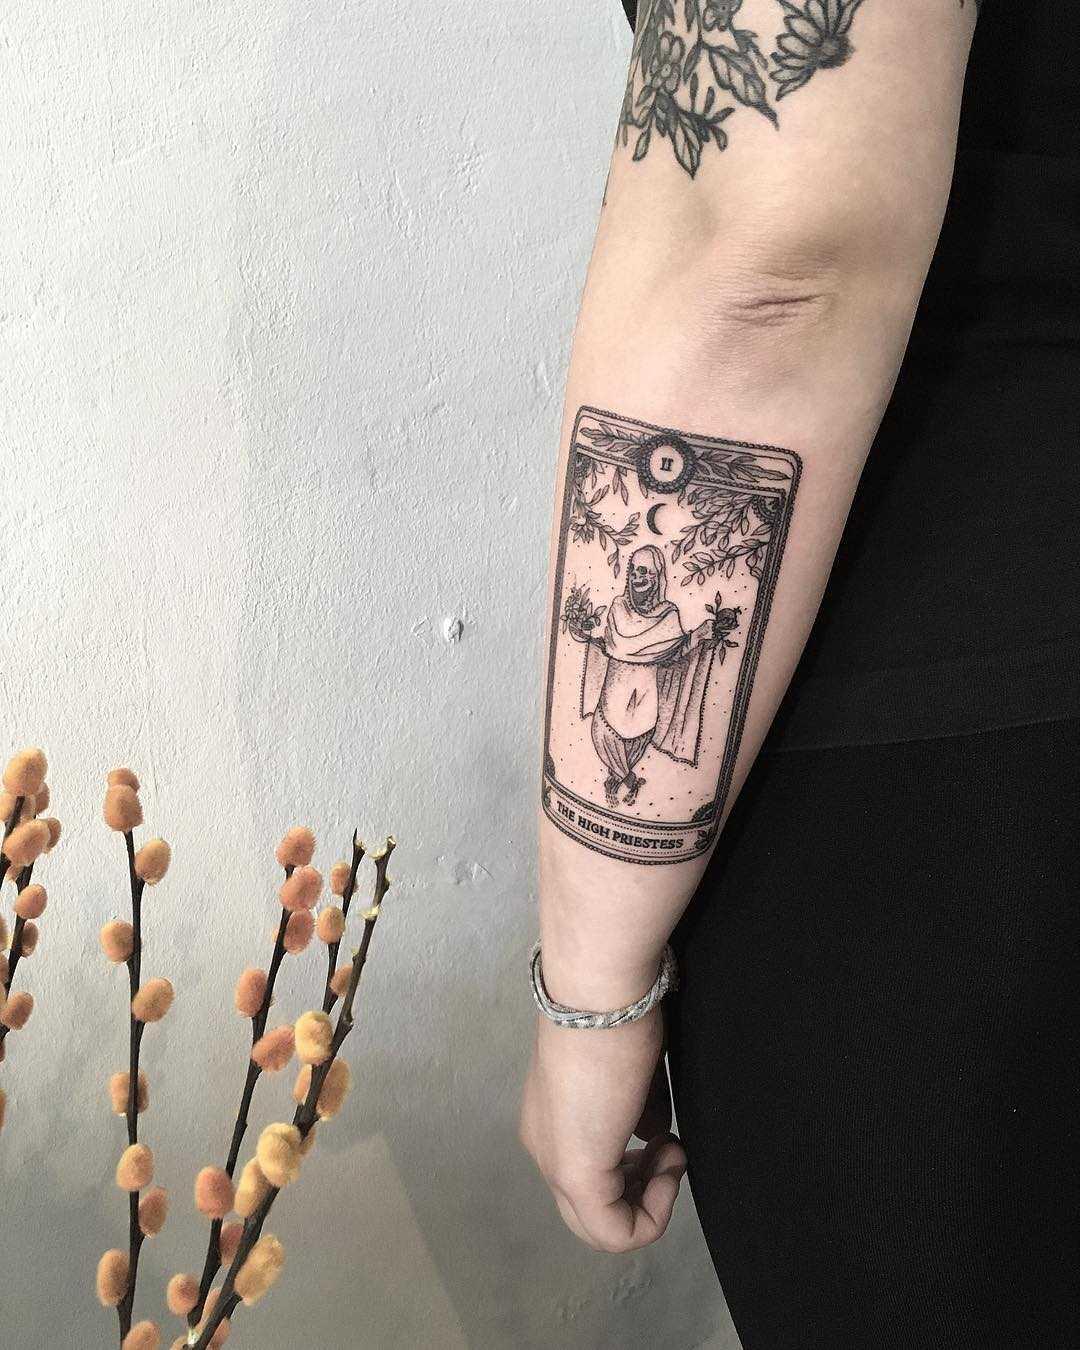 The high priestess by tattooist Spence @zz tattoo